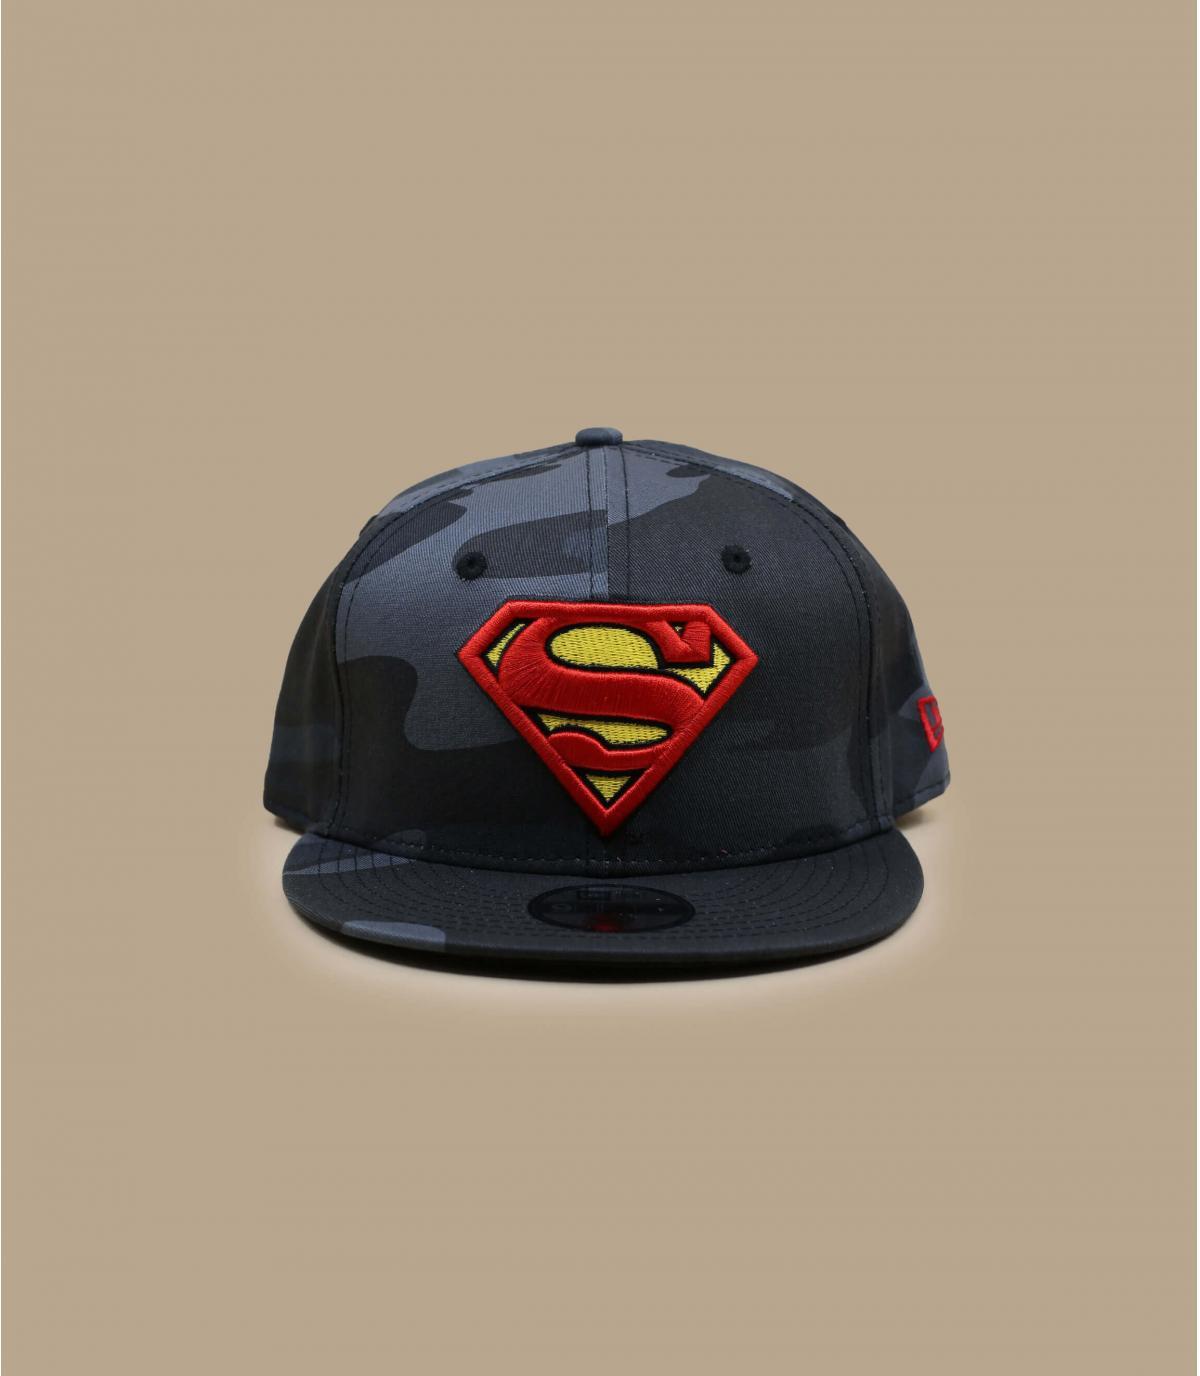 Détails Kids Superman Camo 950 midnight - image 2